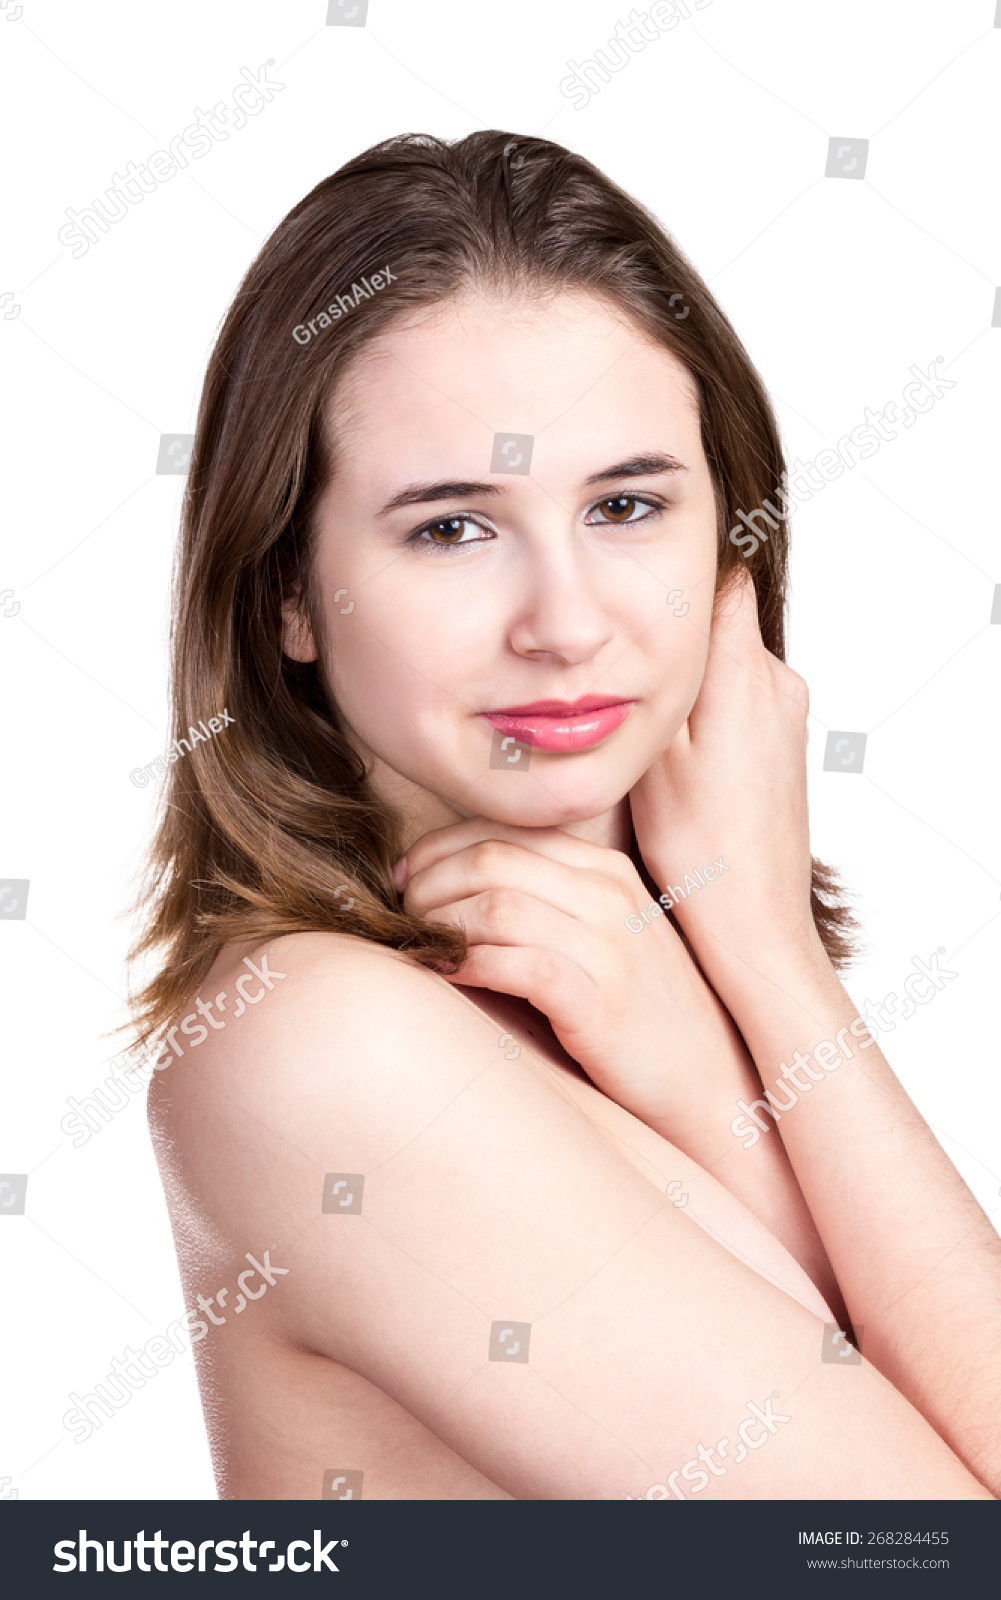 Mamta kulkarni sex images